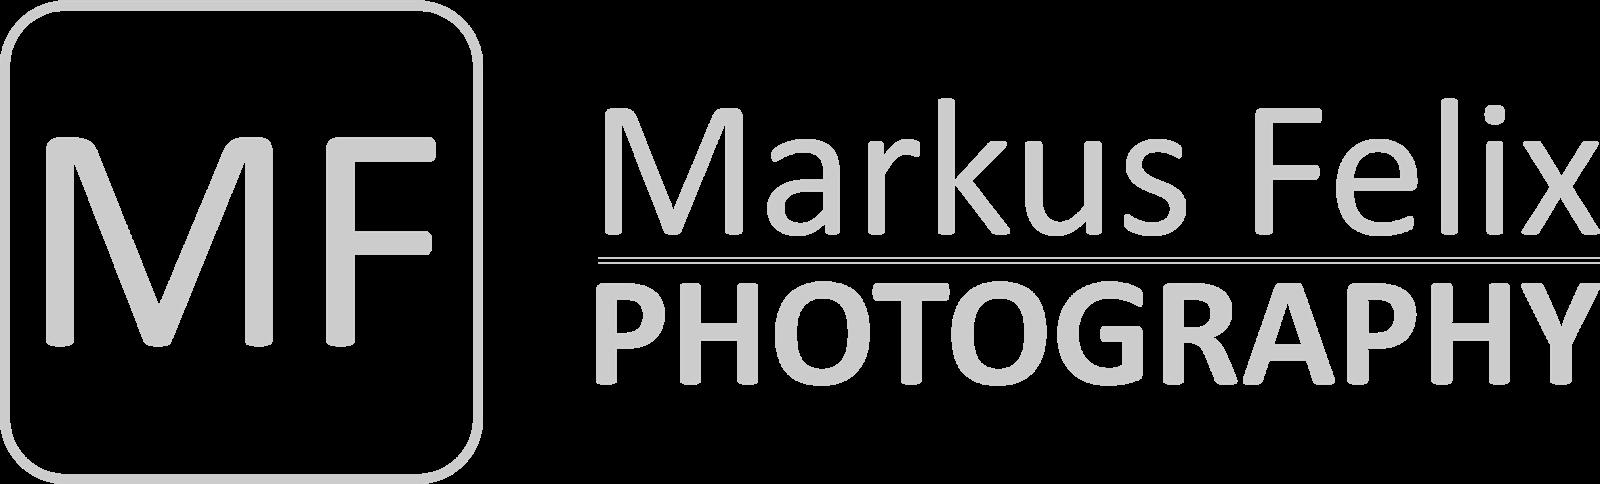 Markus Felix Photography - Logo